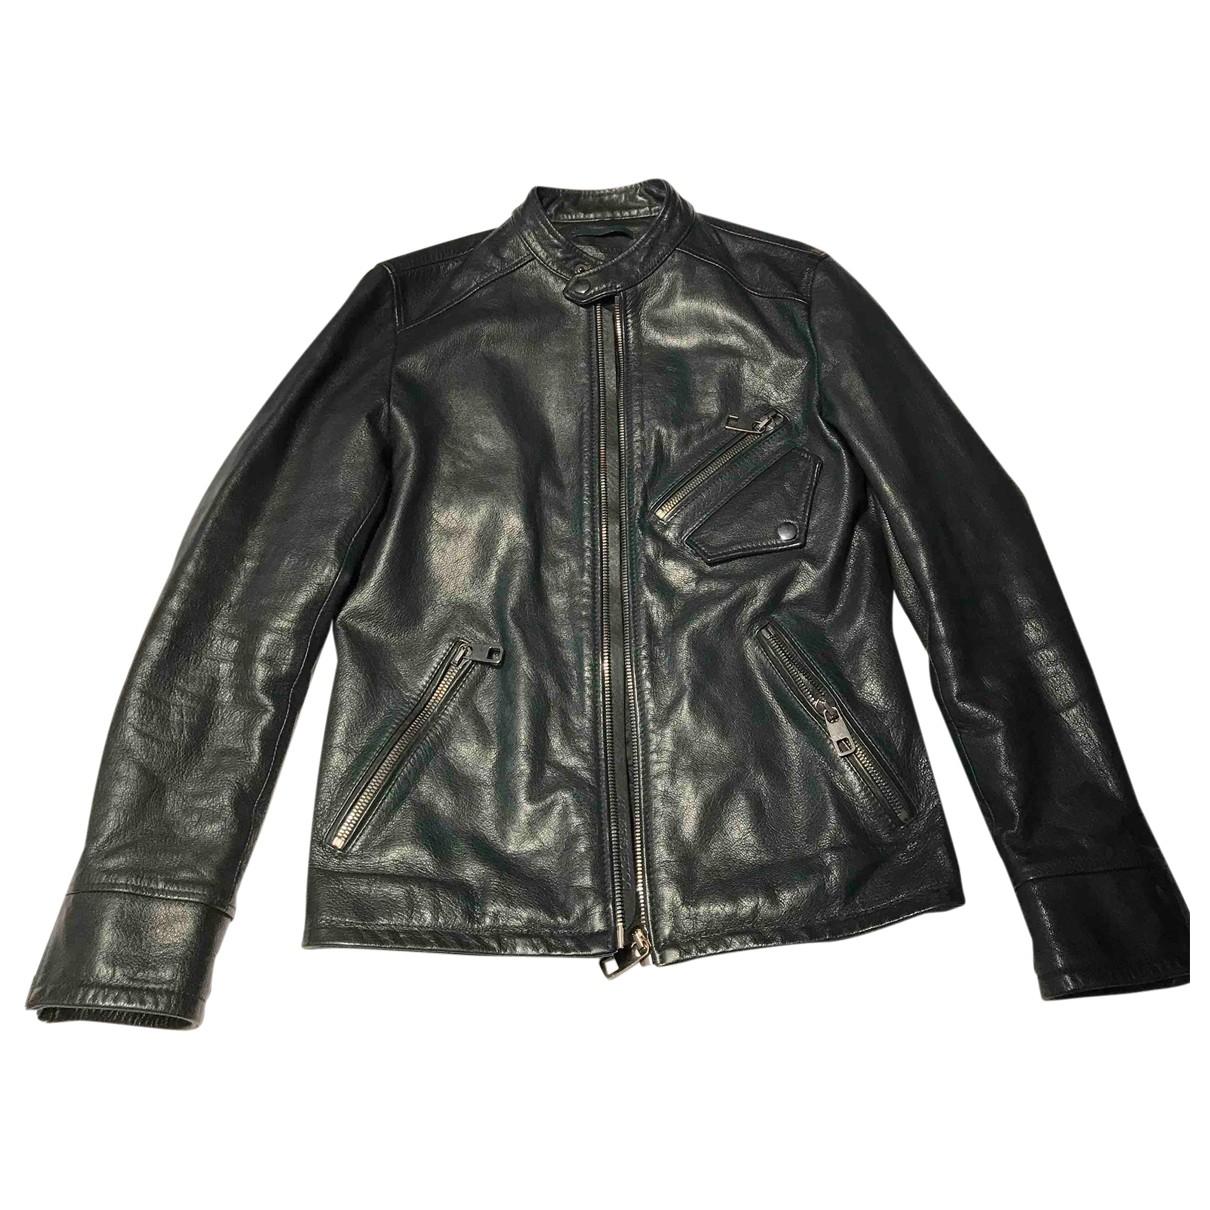 Dolce & Gabbana \N Jacke in  Gruen Leder